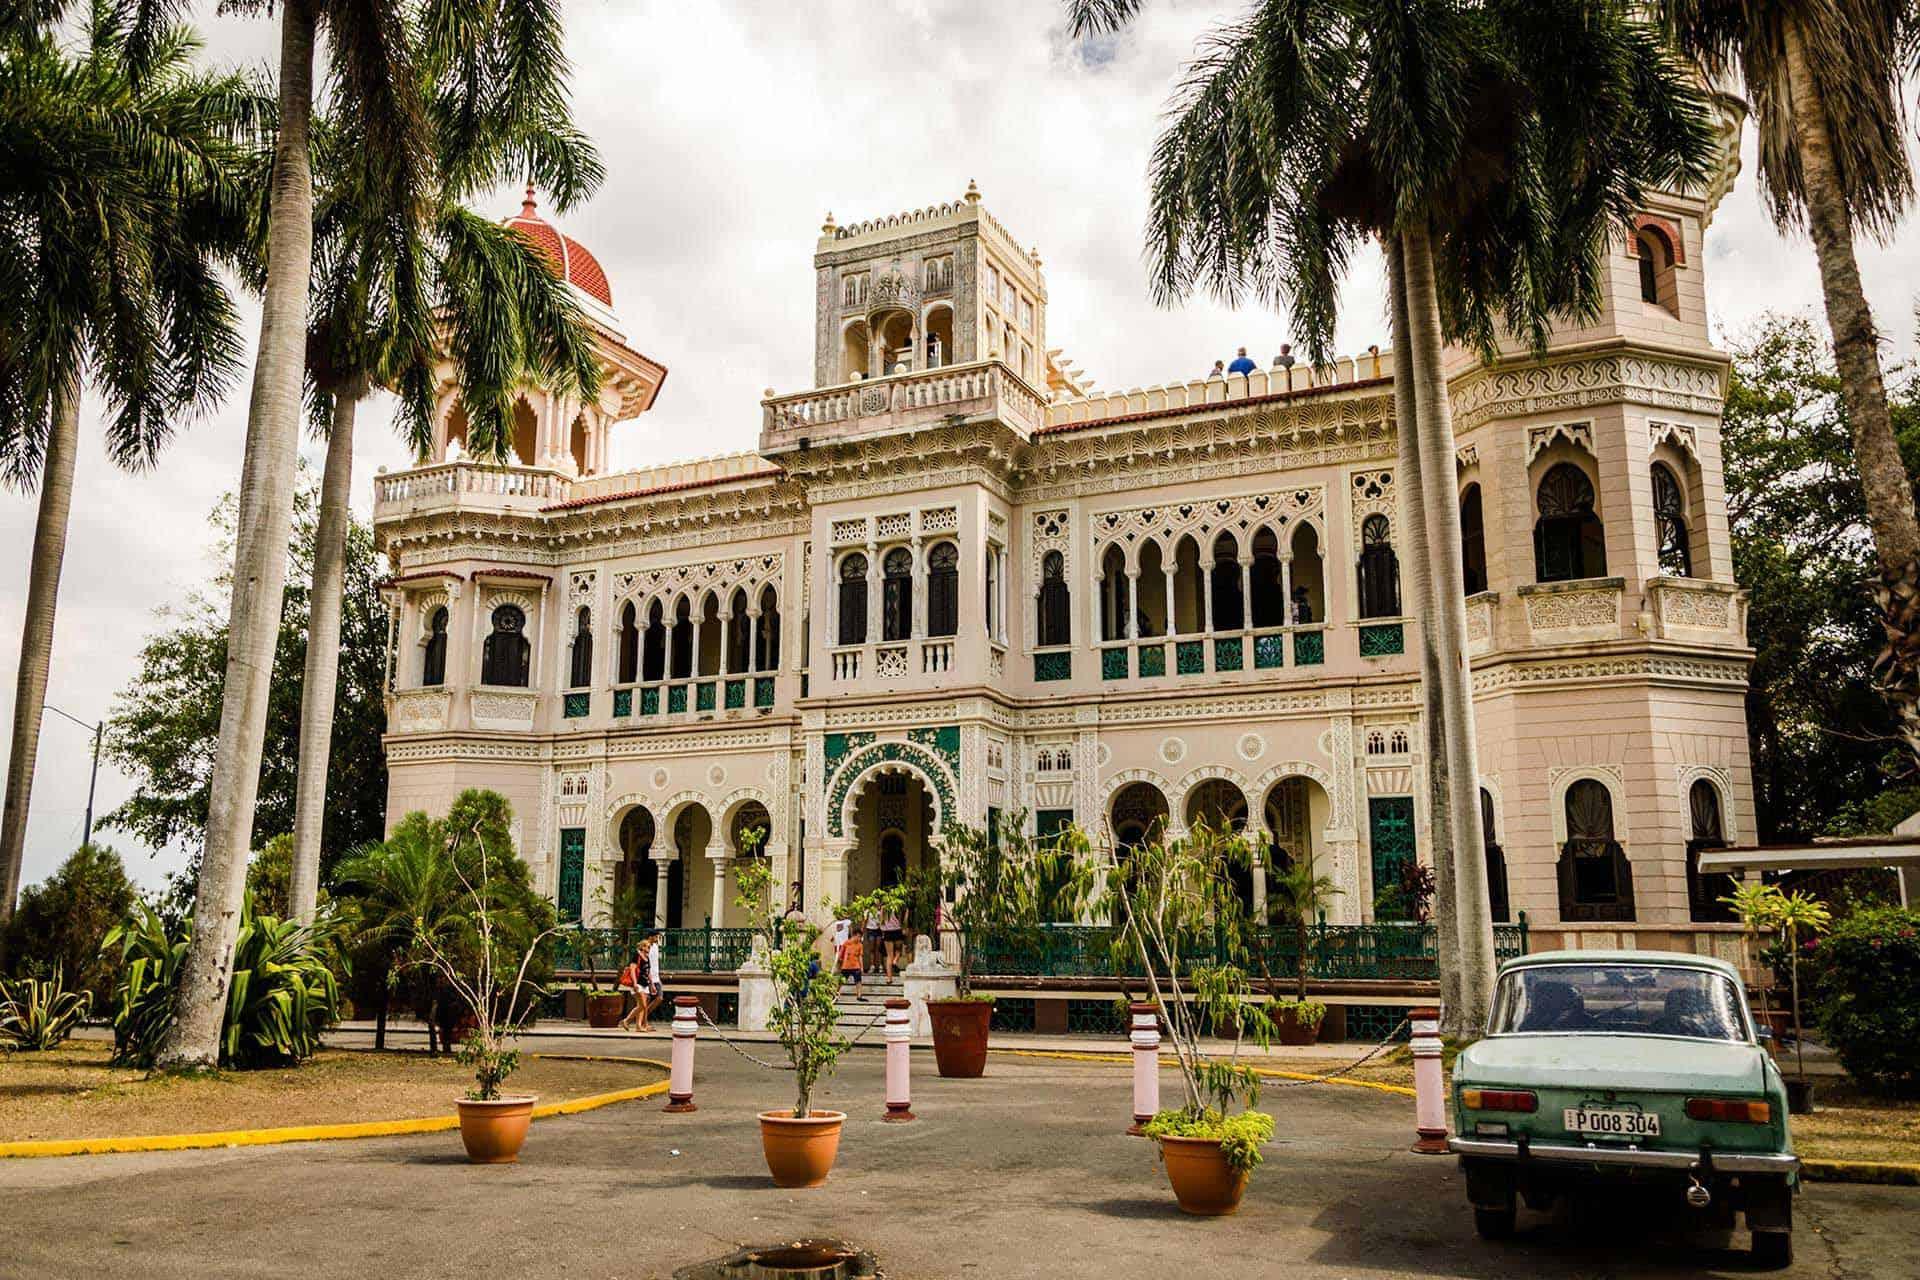 cienfuegos palace cuba autrement 2